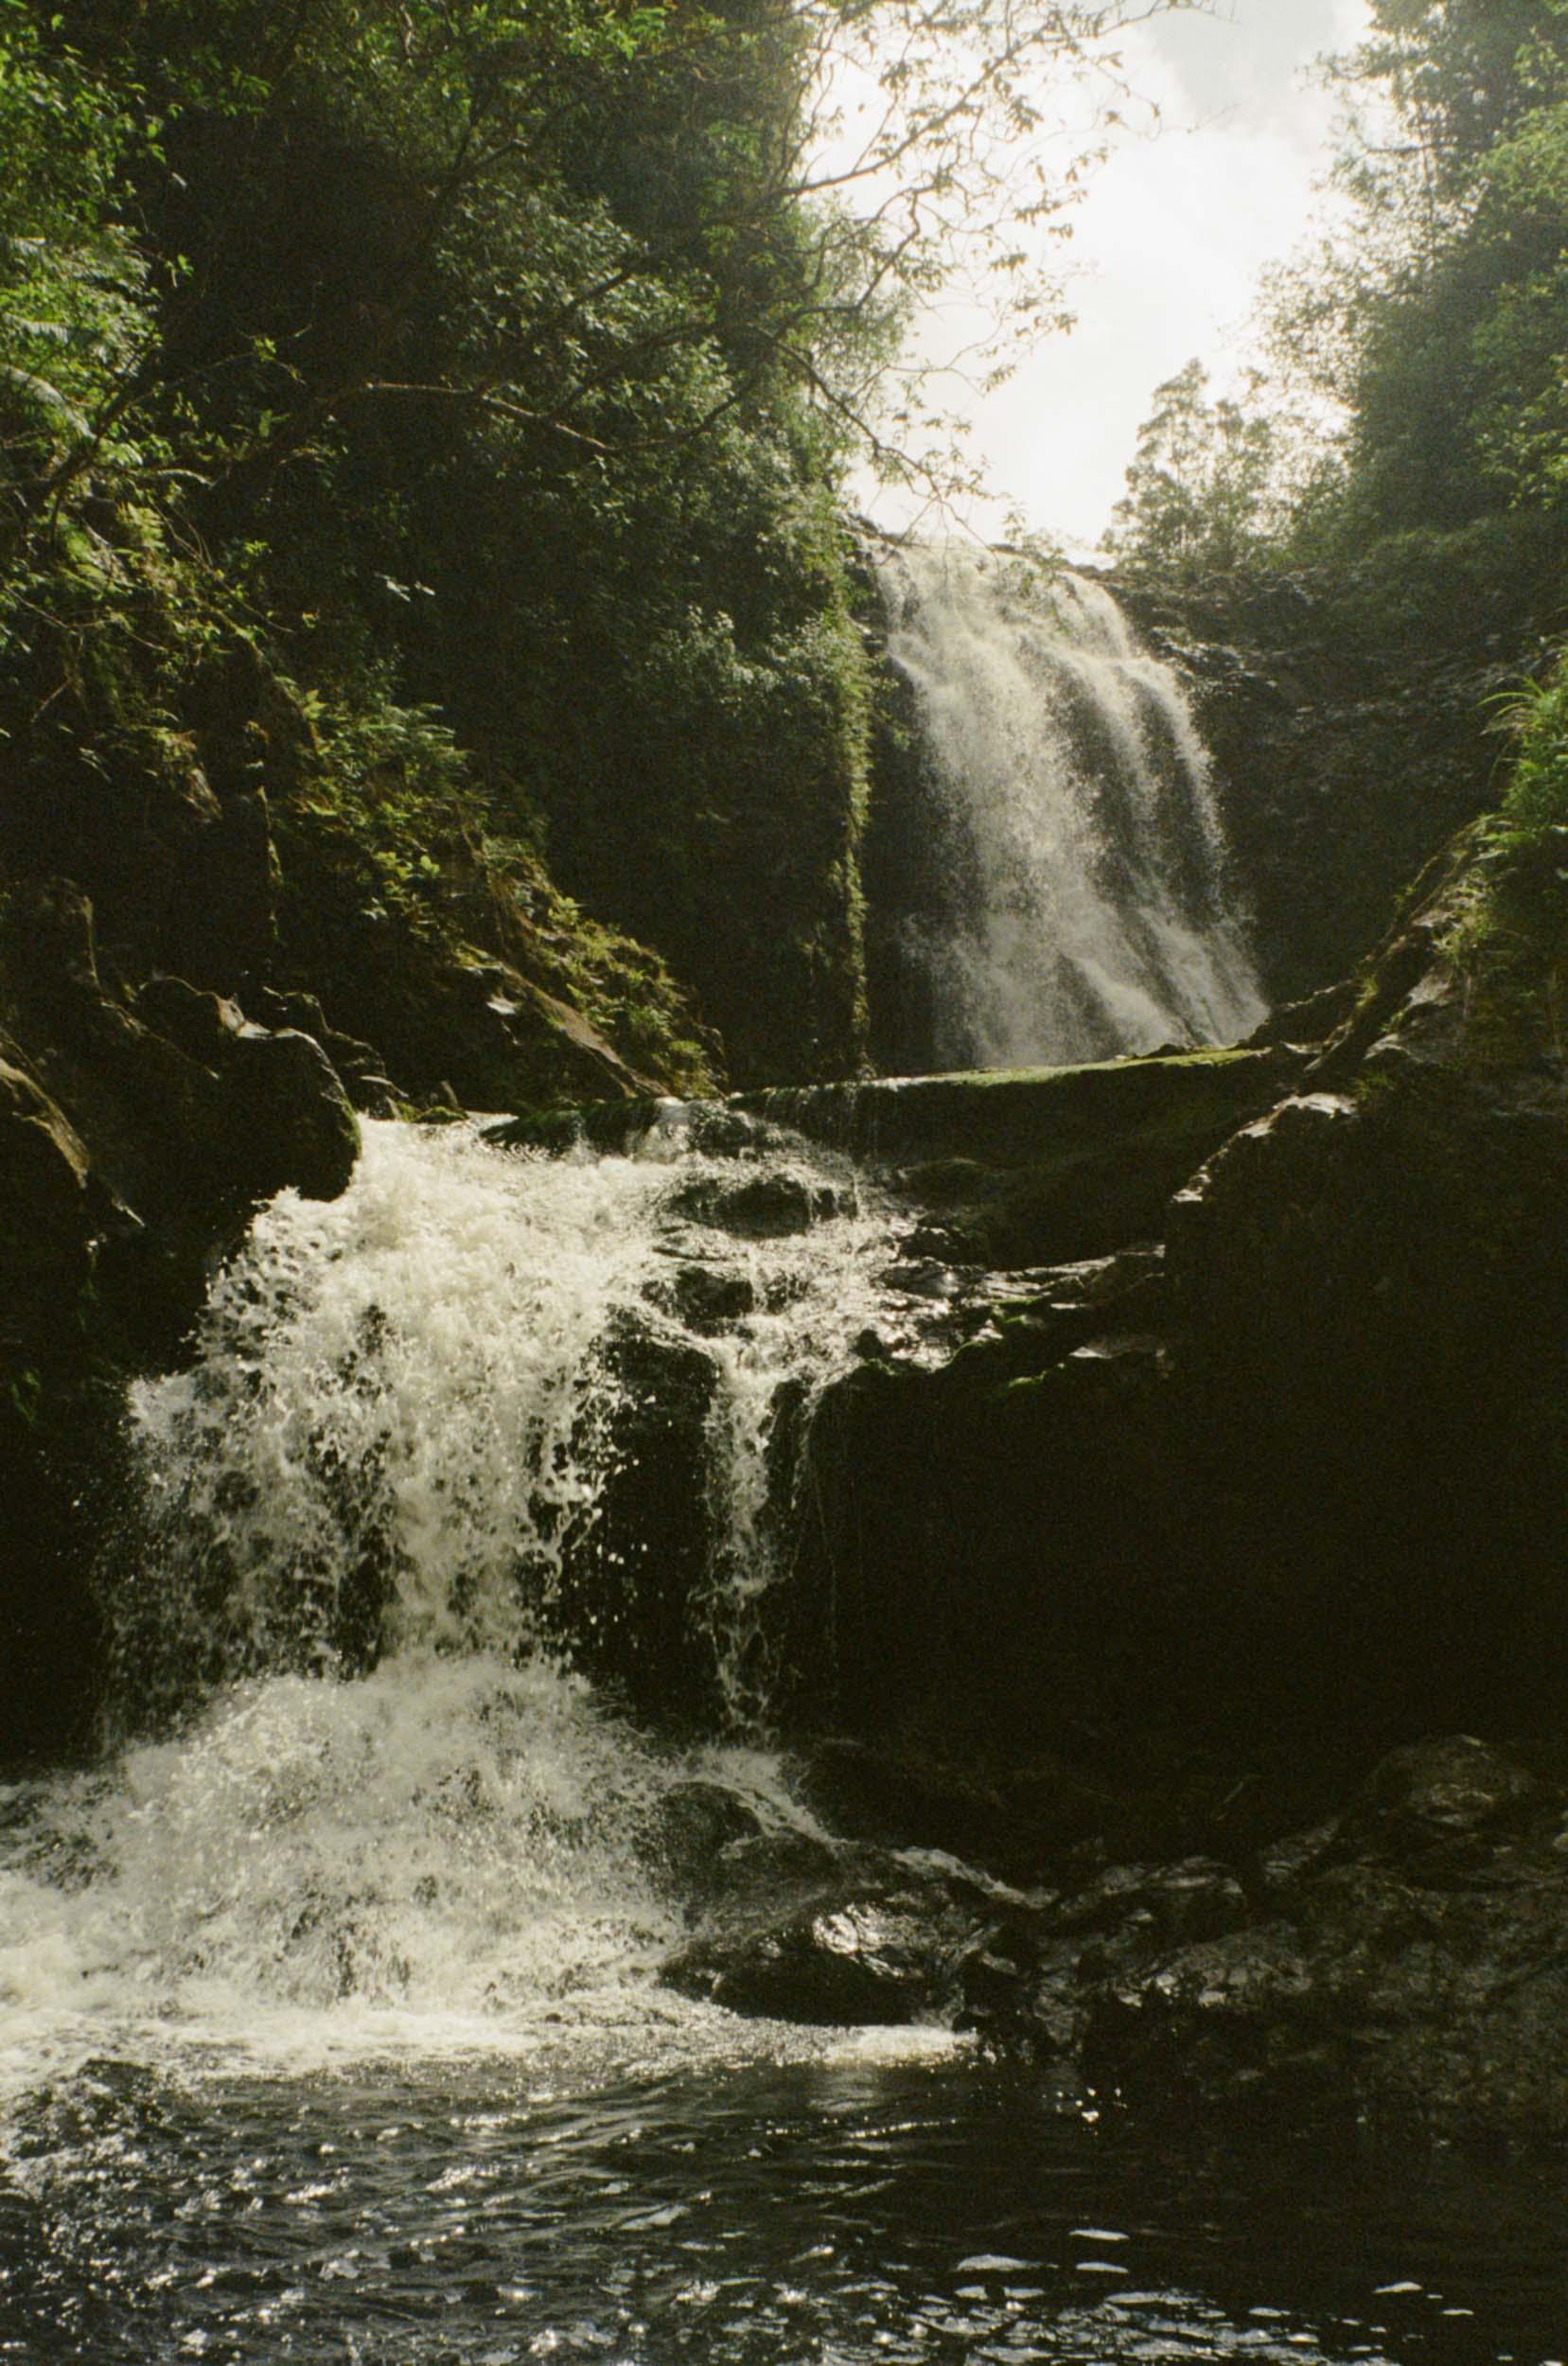 35mm_Maui-9.jpg